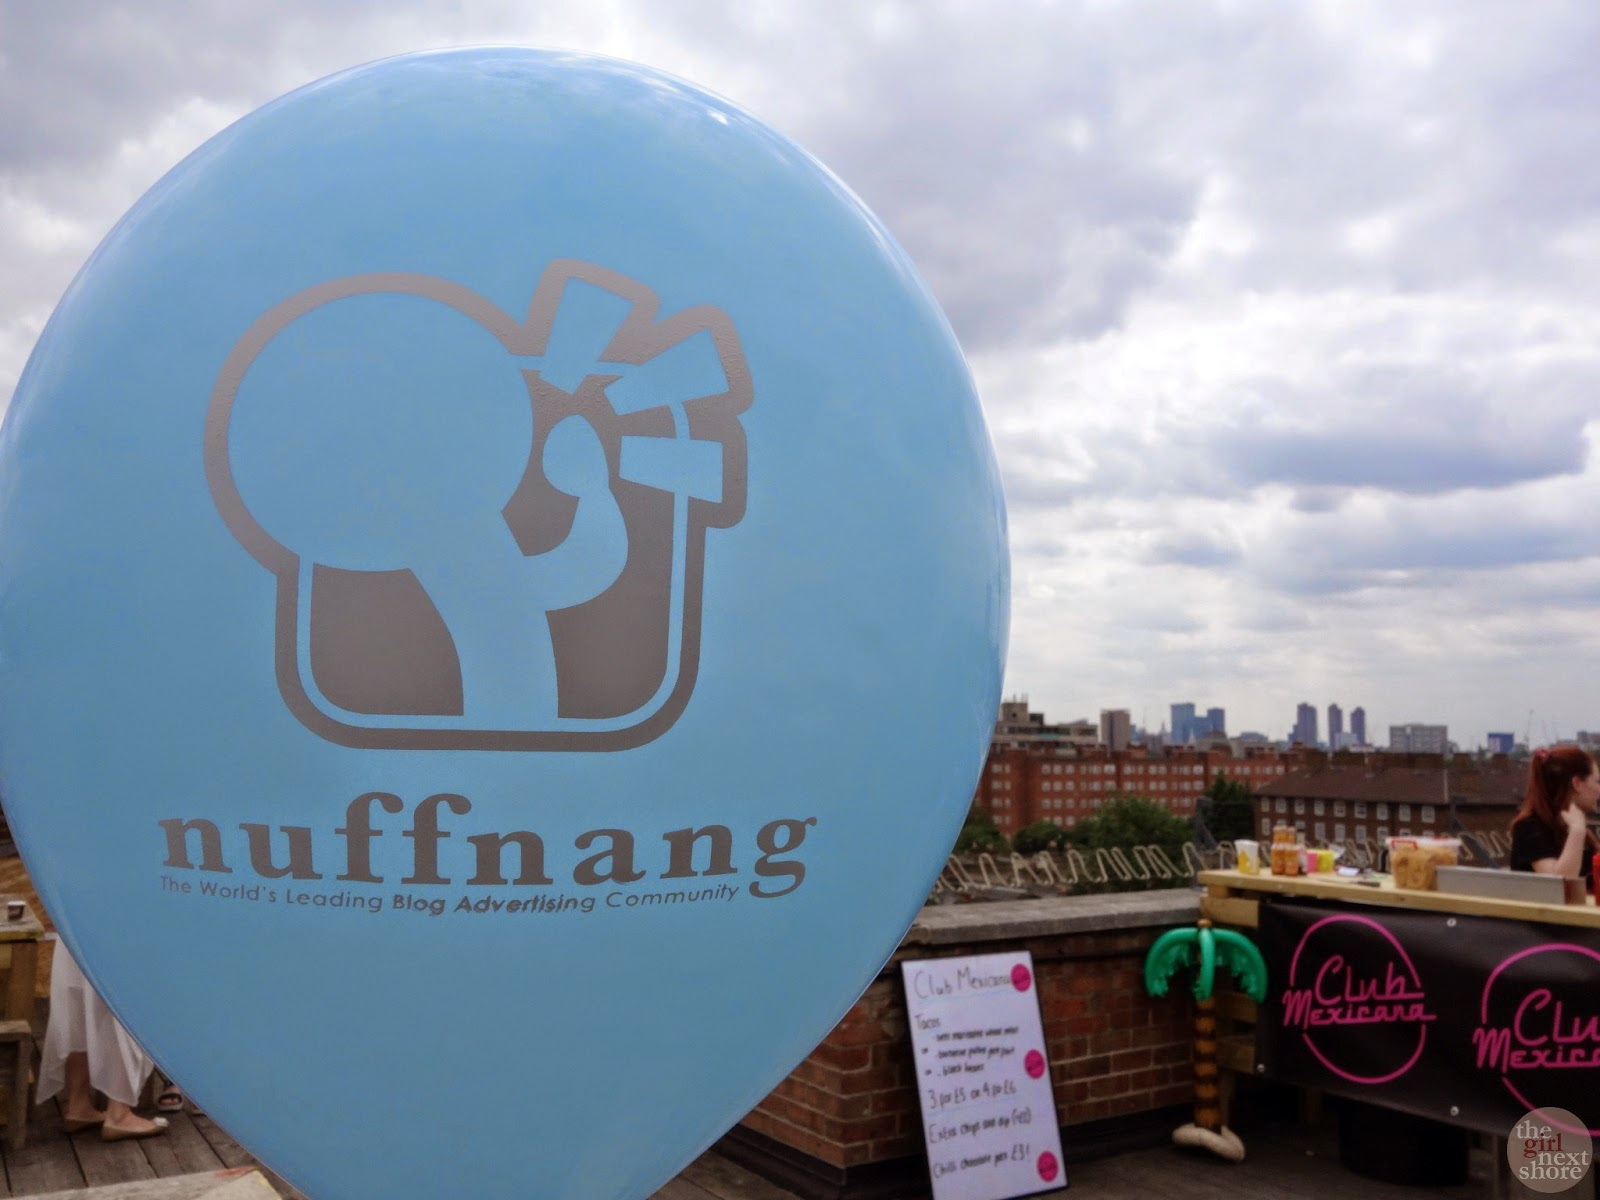 Happy 1st birthday, Nuffnang UK!